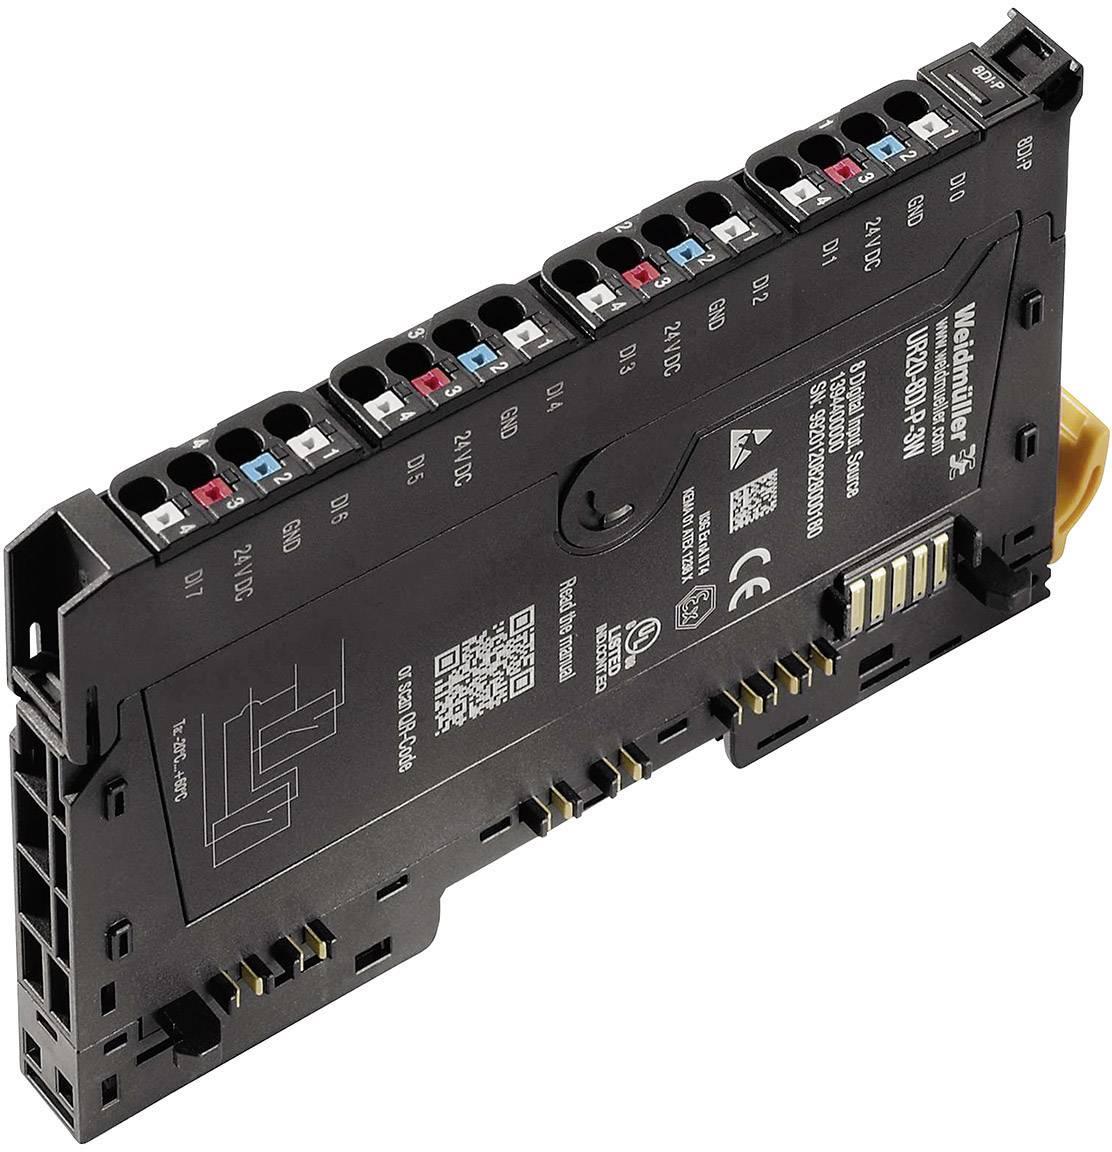 Rozšiřující modul pro PLC Weidmüller UR20-8DI-P-2W, 1315180000